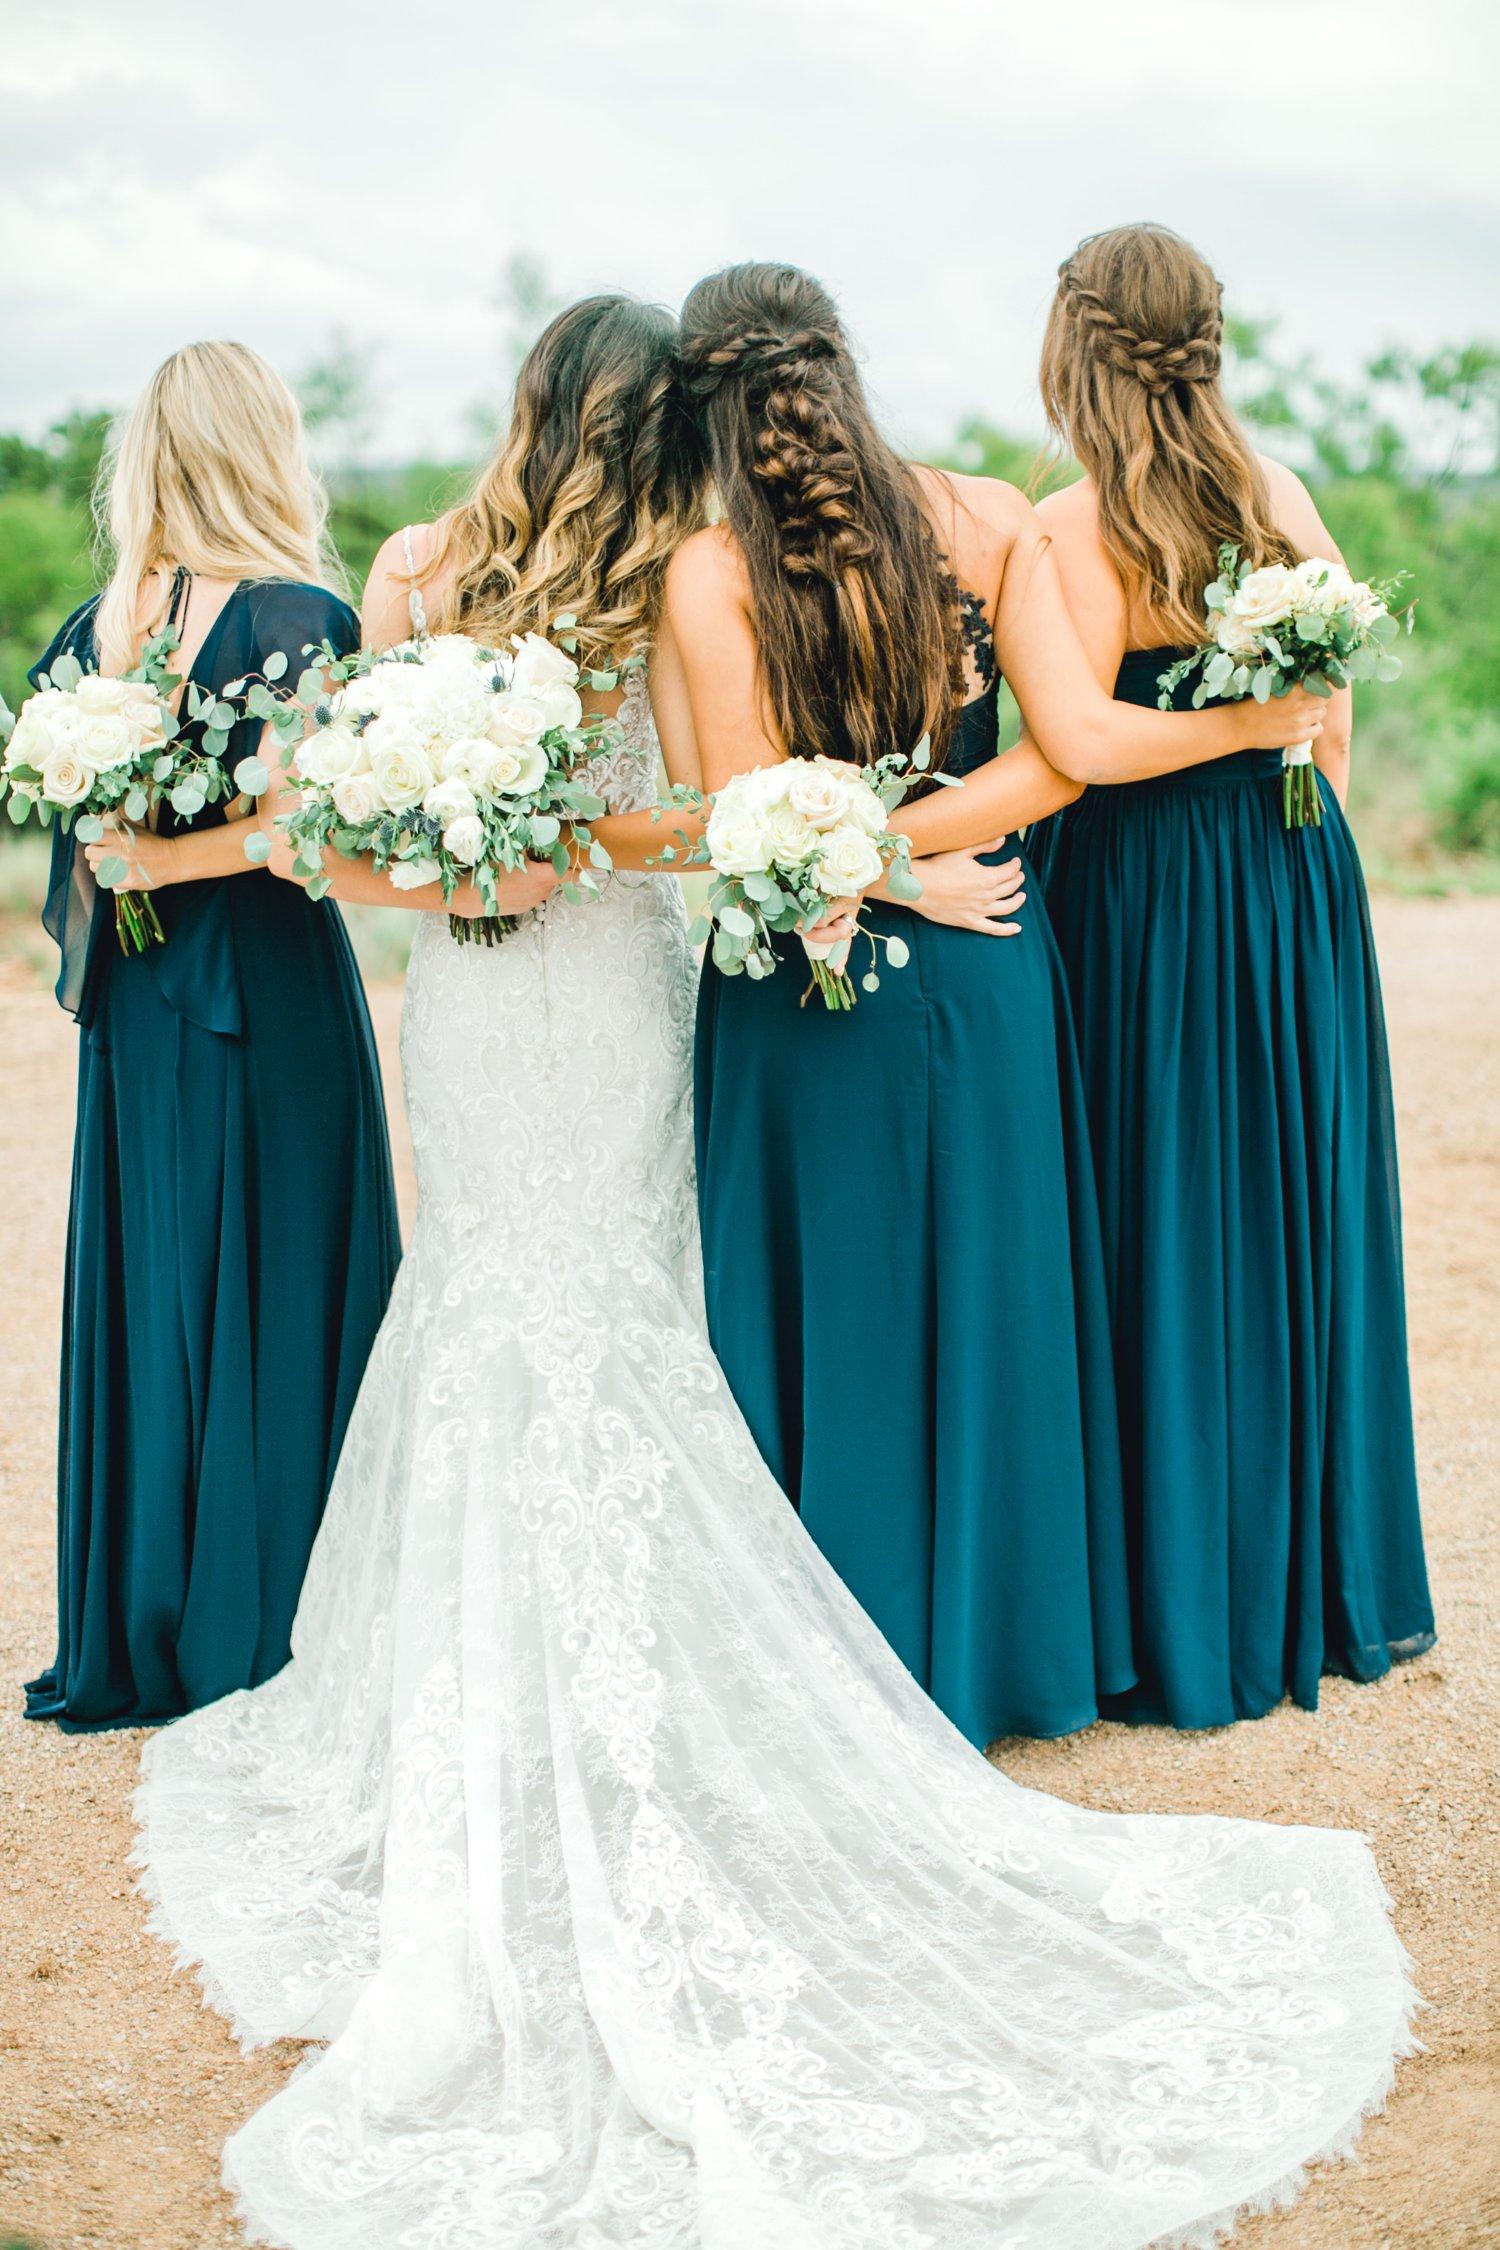 Ashley_John_English_Elegant_Texas_Wedding_Outdoors_Ranch_Caprock_Winery_ALLEEJ_0047.jpg